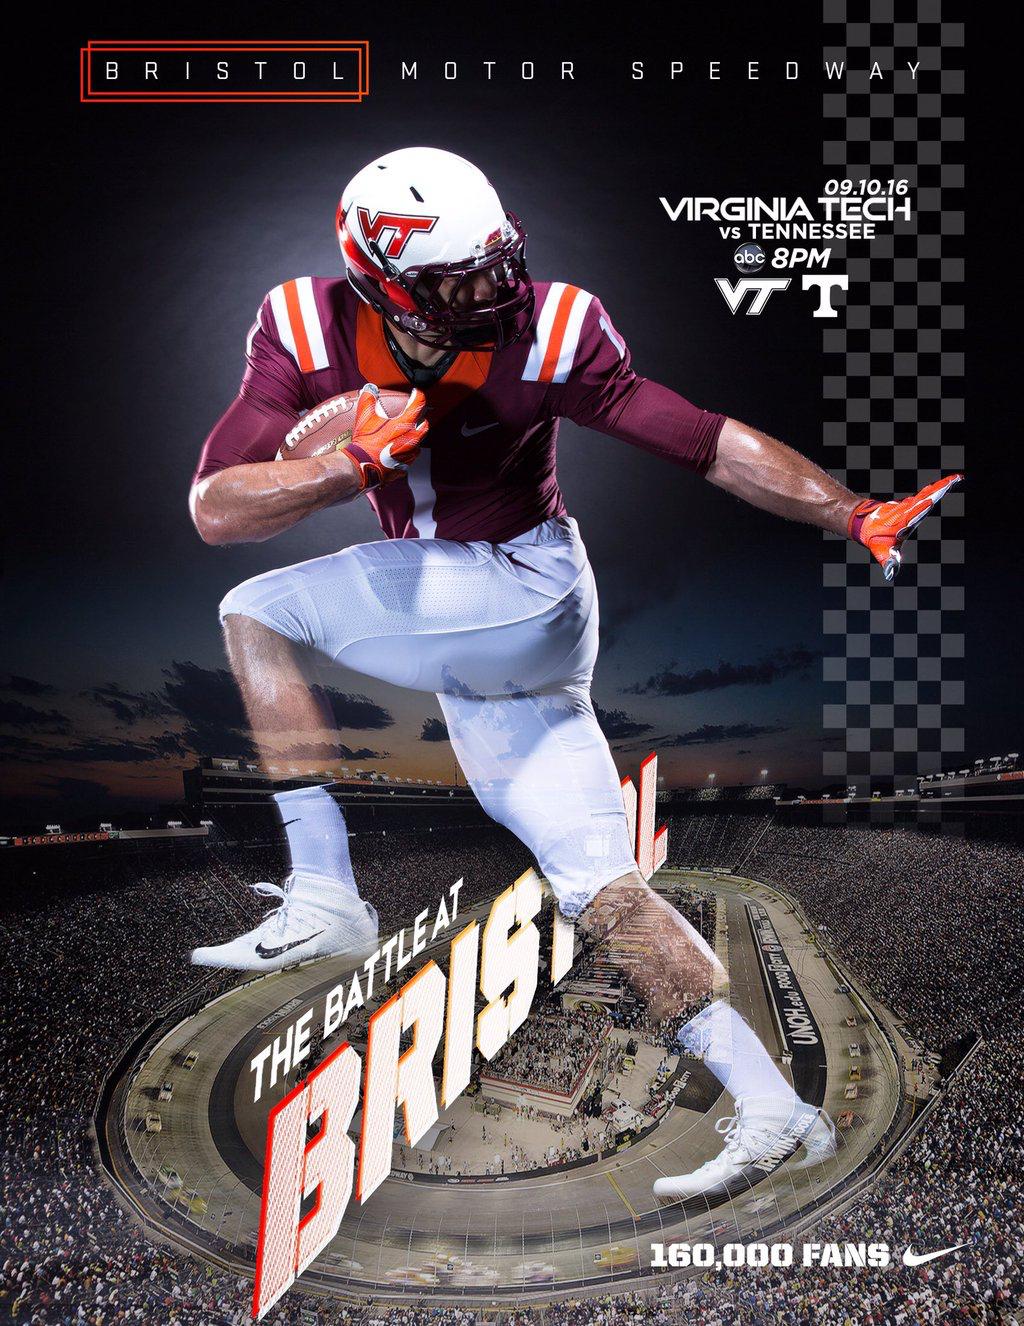 Virginia Tech Sports design, Football pictures, Bristol